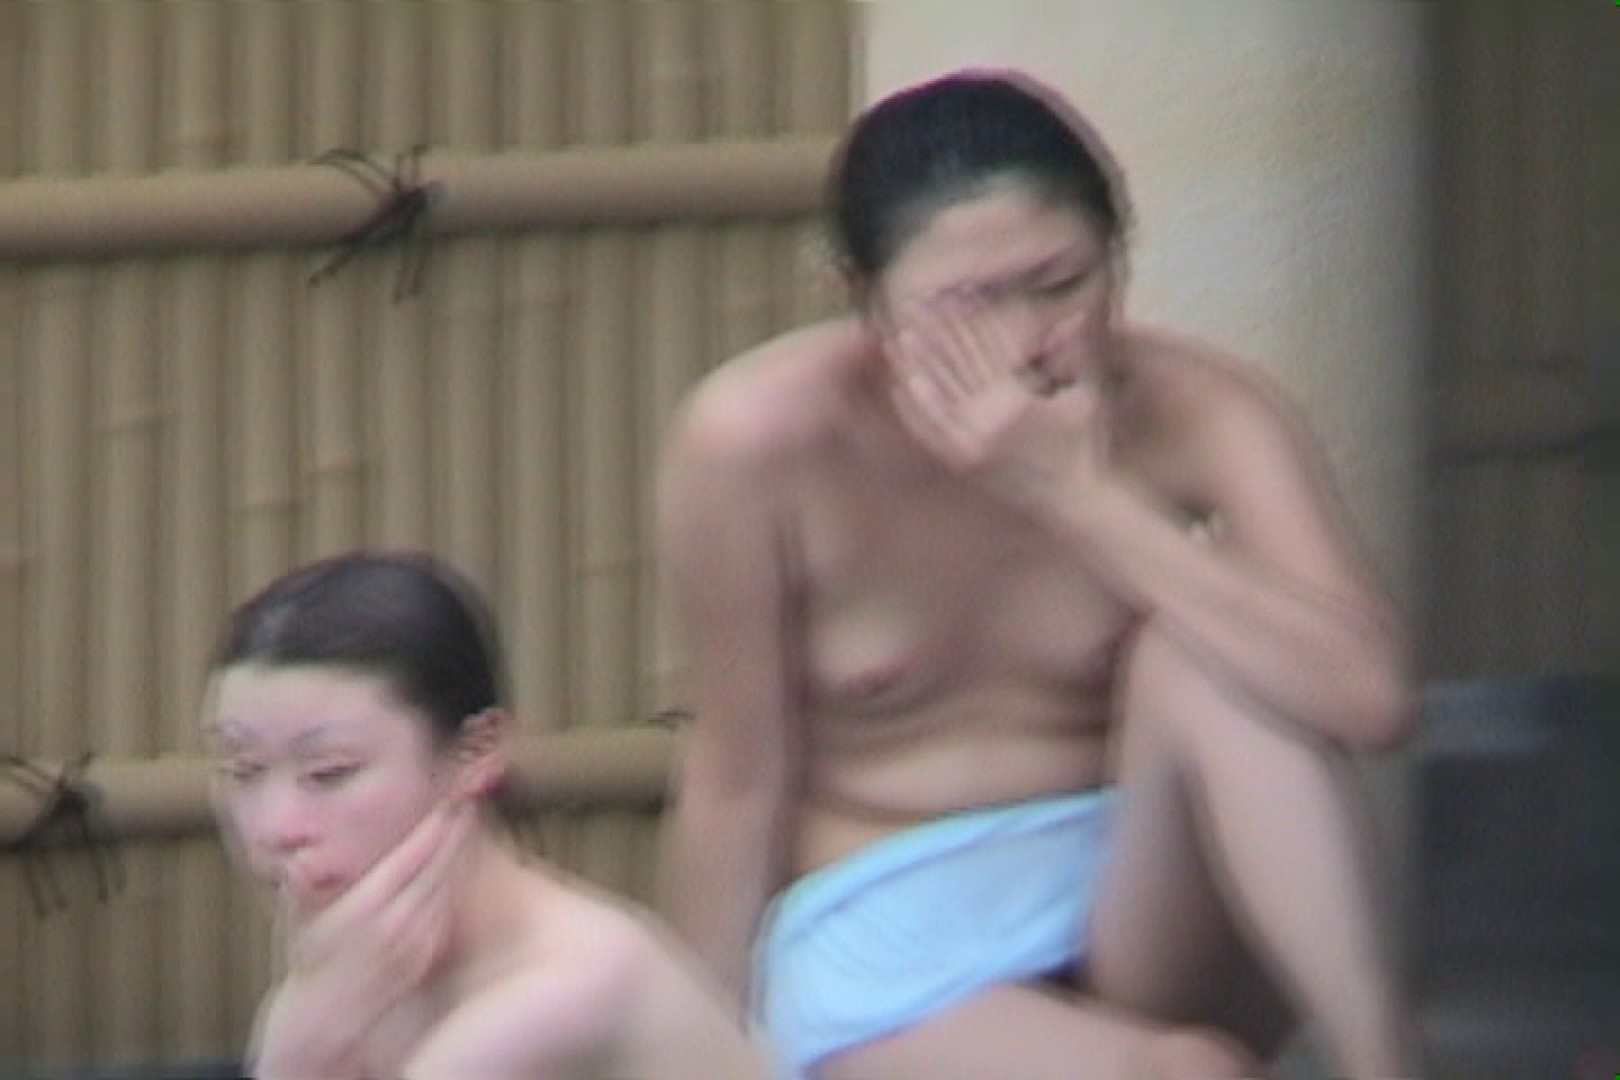 Aquaな露天風呂Vol.601 エッチな盗撮 アダルト動画キャプチャ 99pic 68